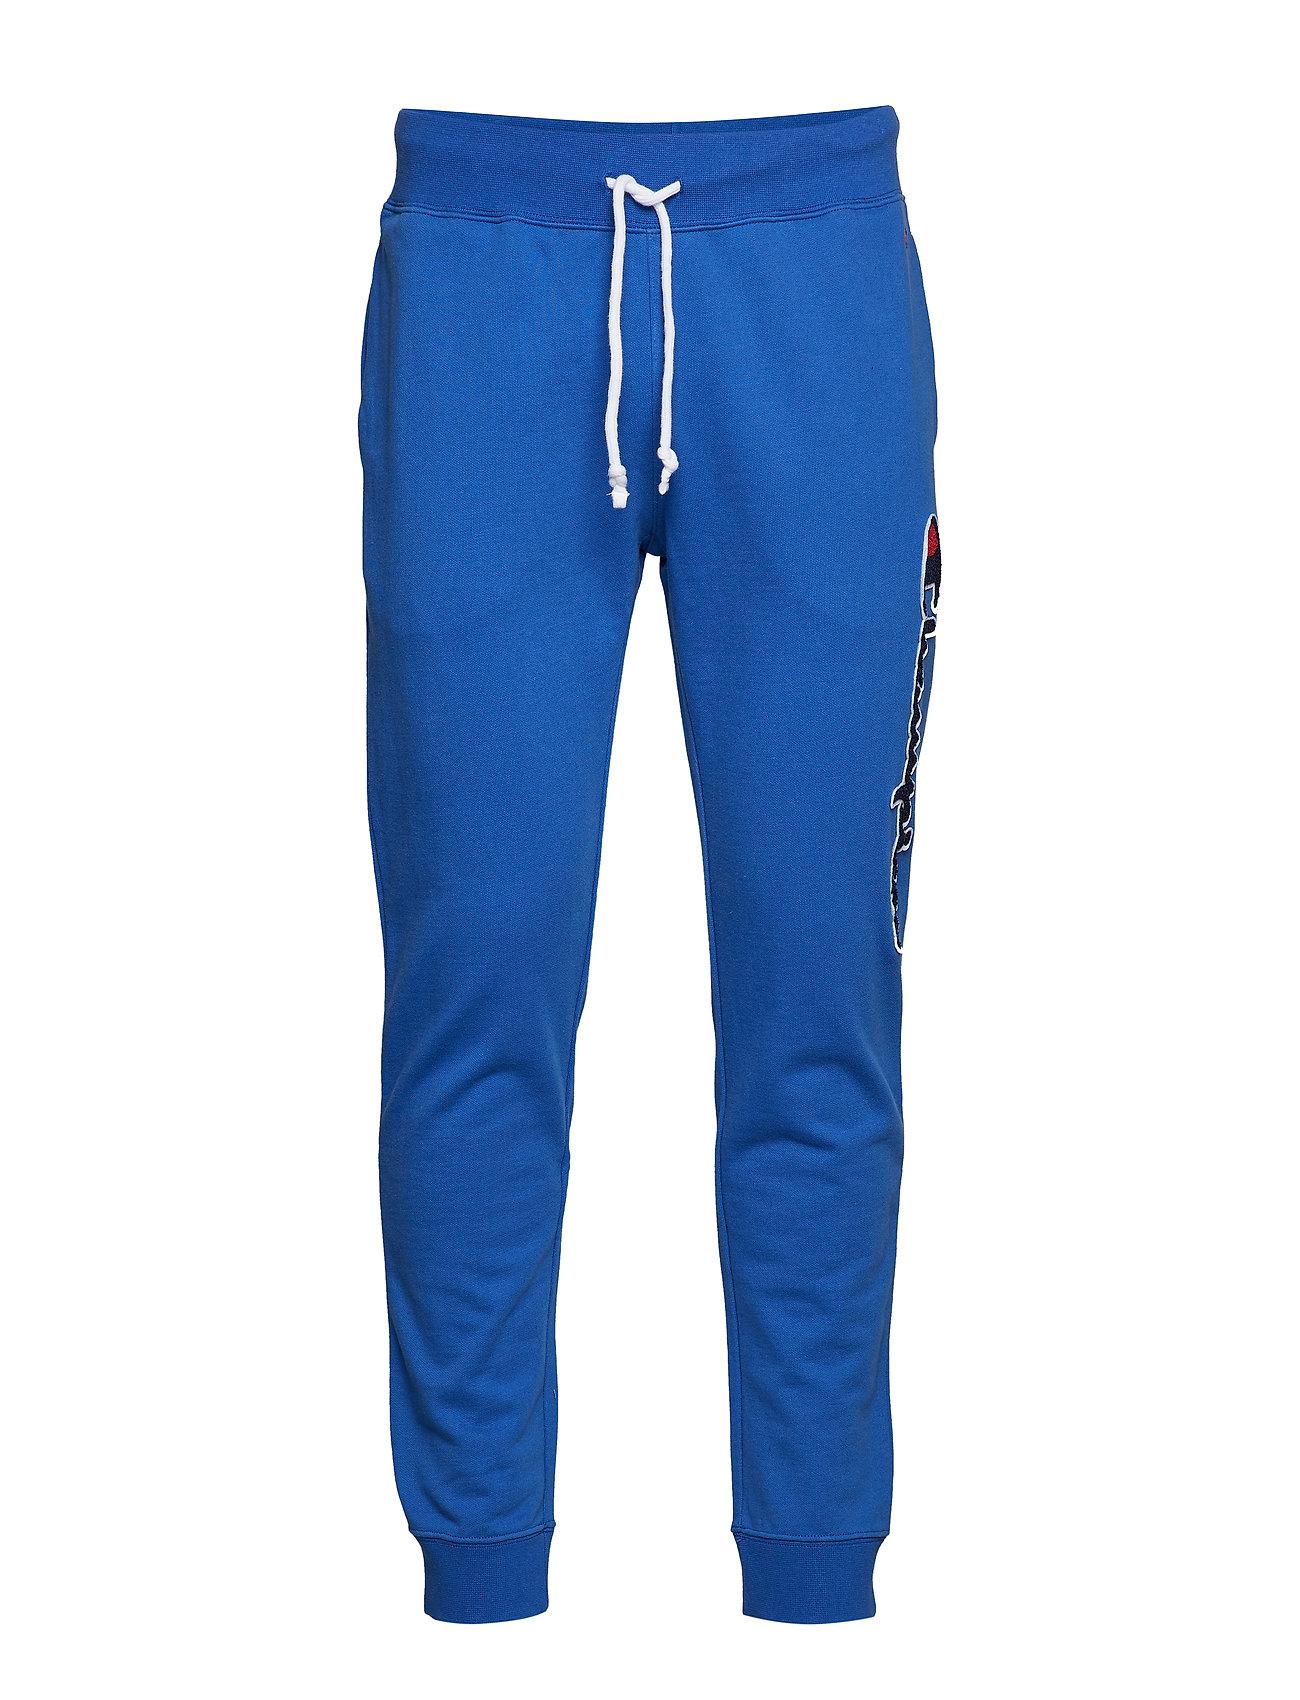 Champion Rochester Rib Cuff Pants - ROYAL BLUE